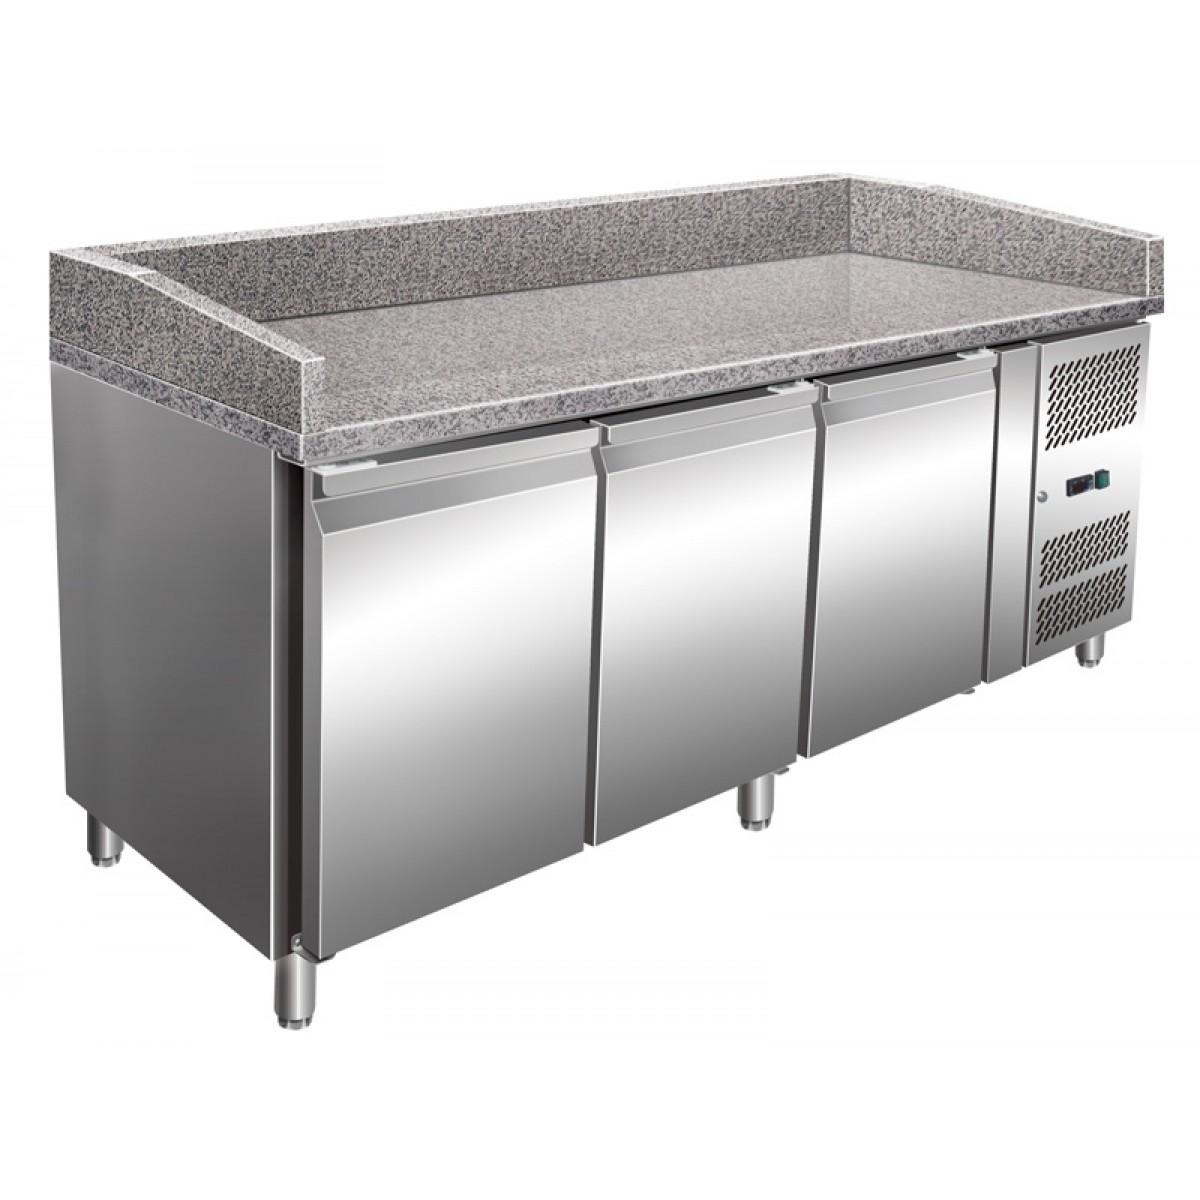 Pizzakølebord | 3 døre | granitbordplade | bagplade